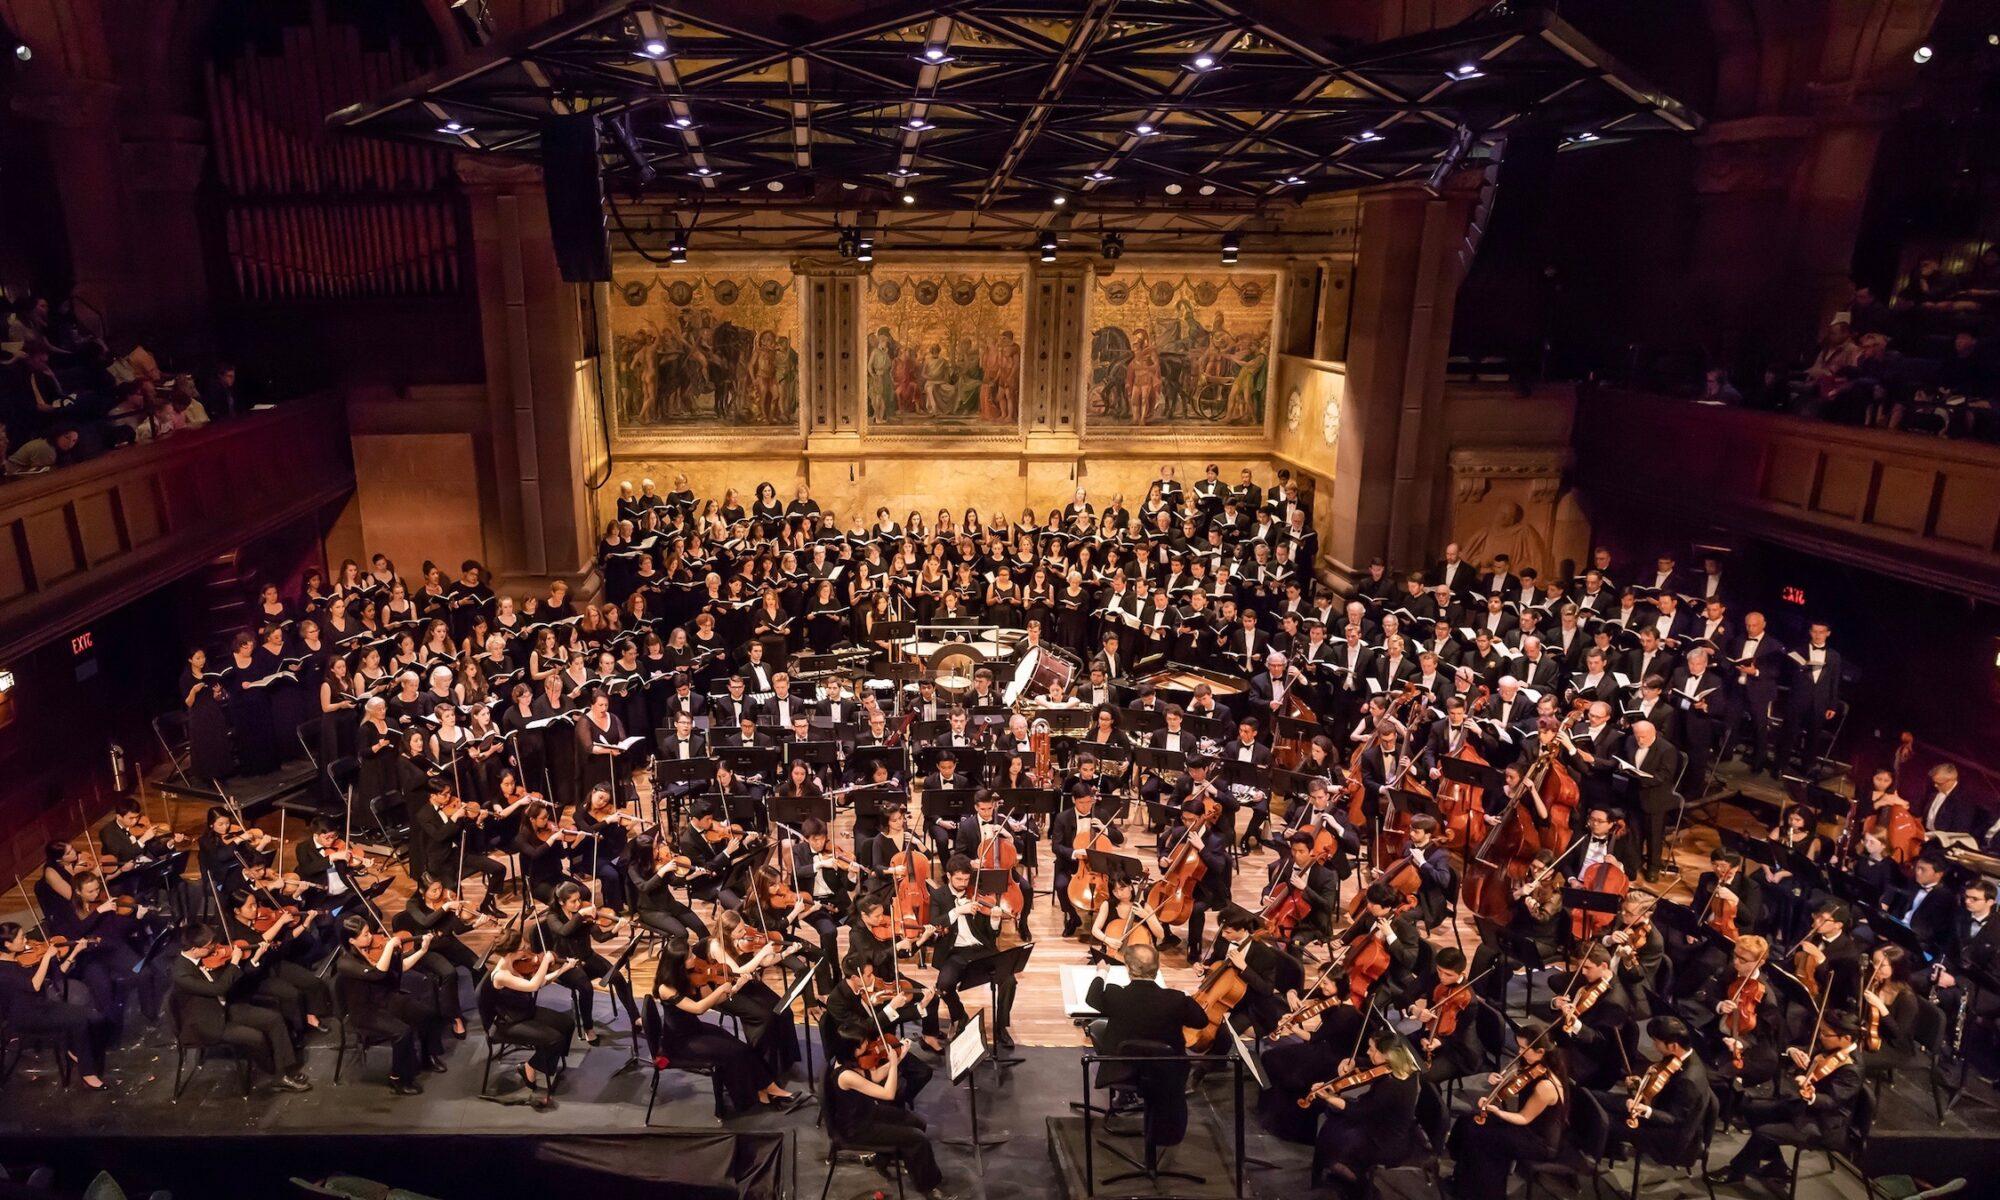 The Princeton University Orchestra